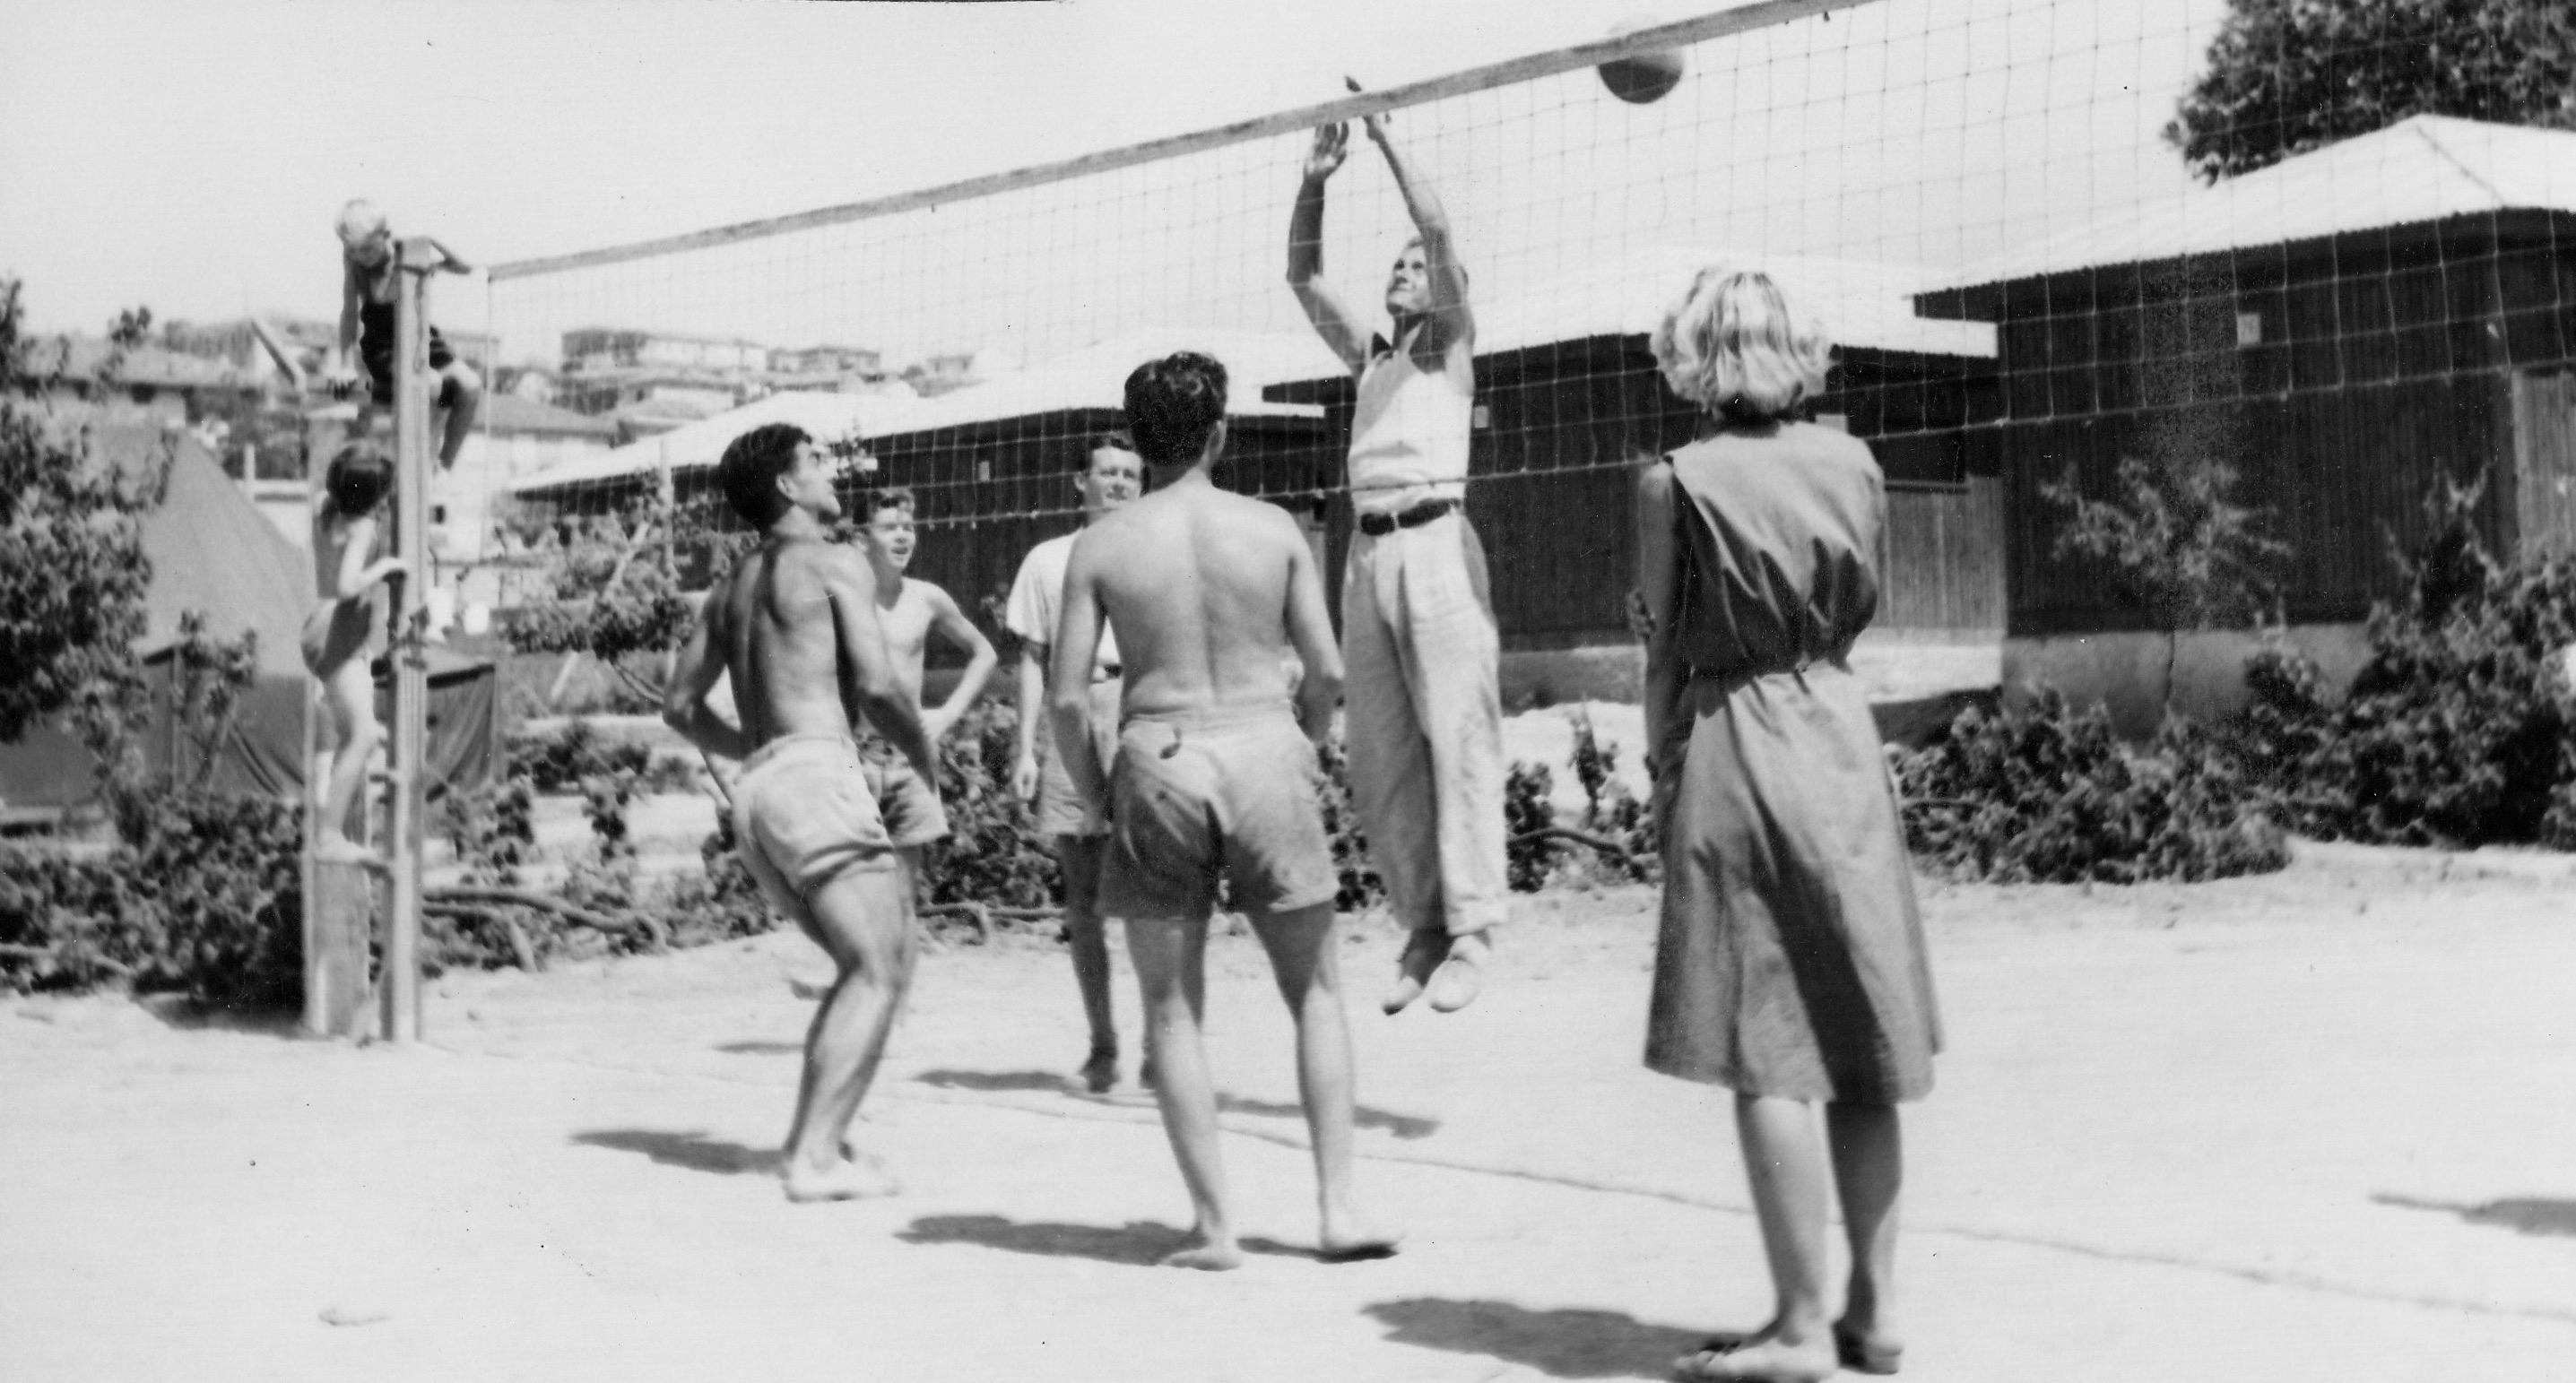 San Sabba volleyball, 1950-51